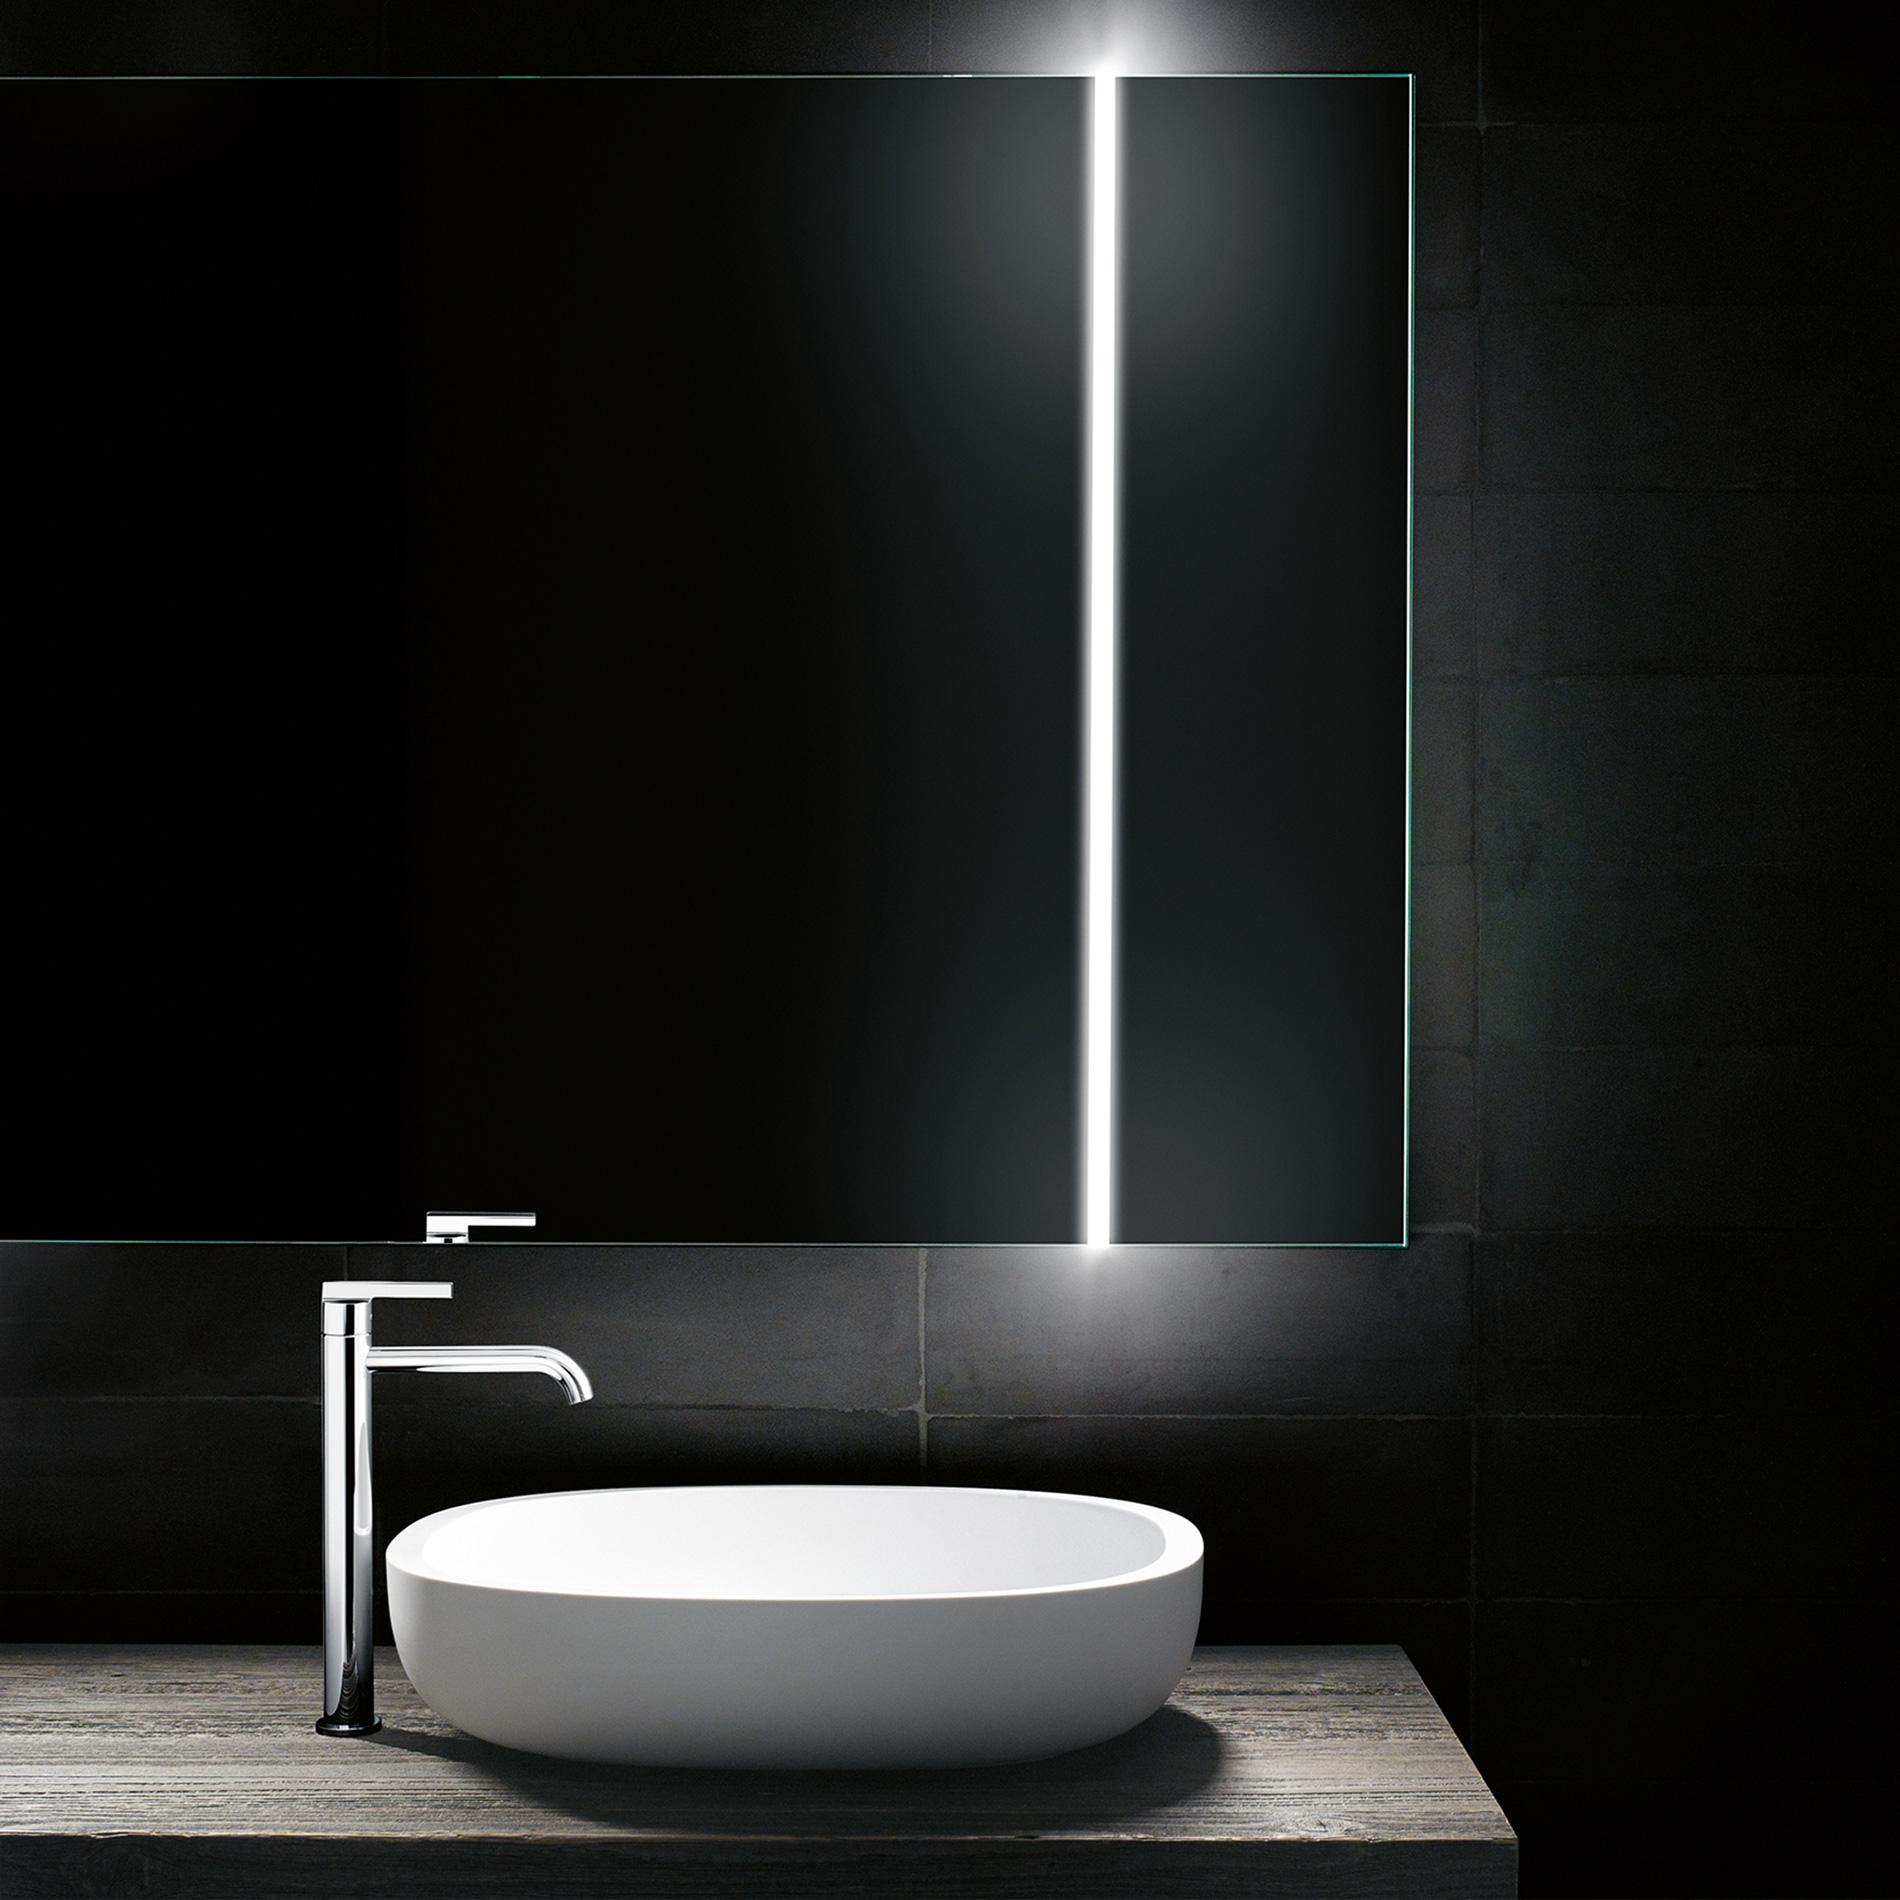 Nicos-International-home-products-Boffi-washbasins-1